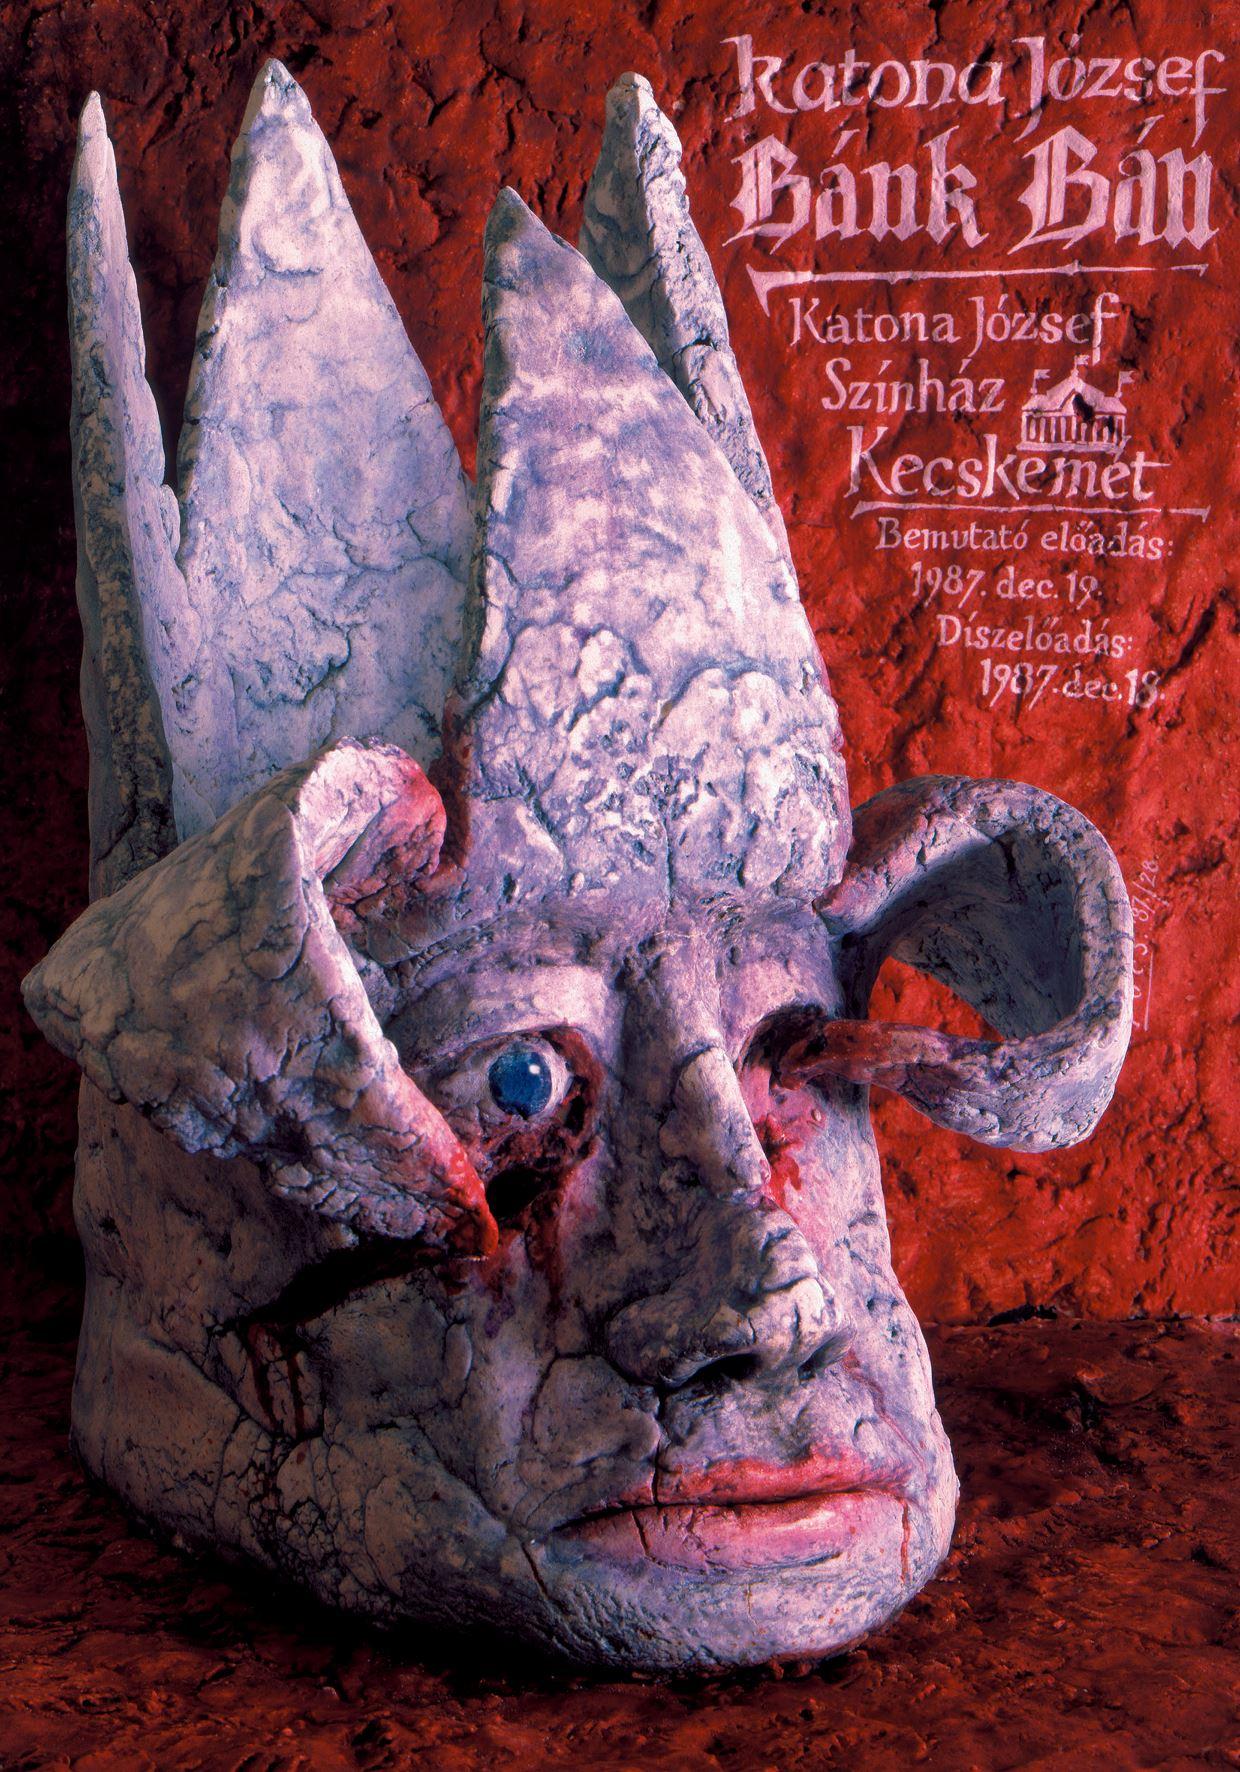 Péter Pócs - József Katona- Ban Bánk (Theatrical Poster, 1987)